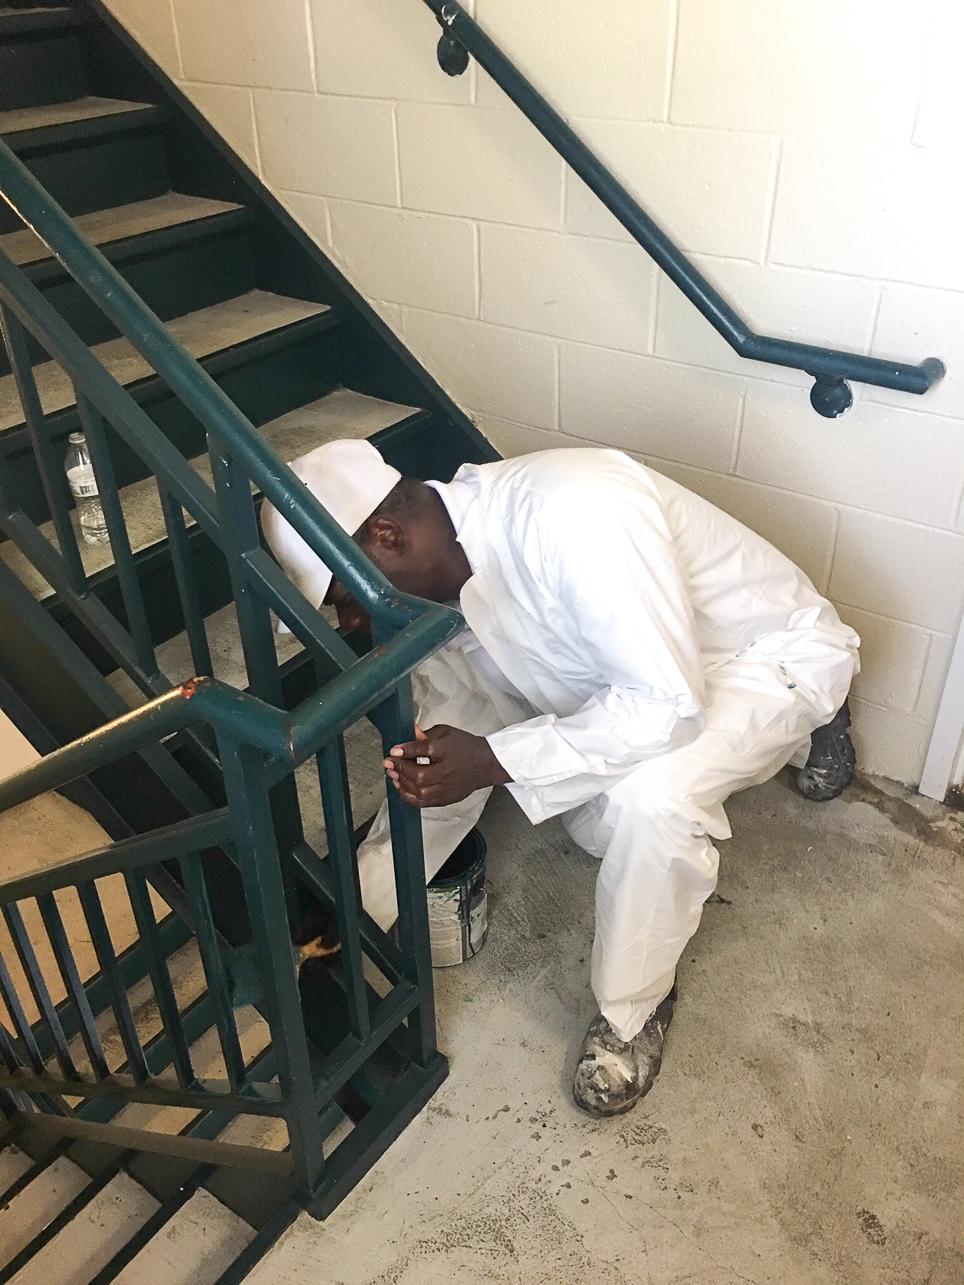 CofC Painter Remus Aiken paints the handrails at Warren Place during the 2020 COVID-19 pandemic.